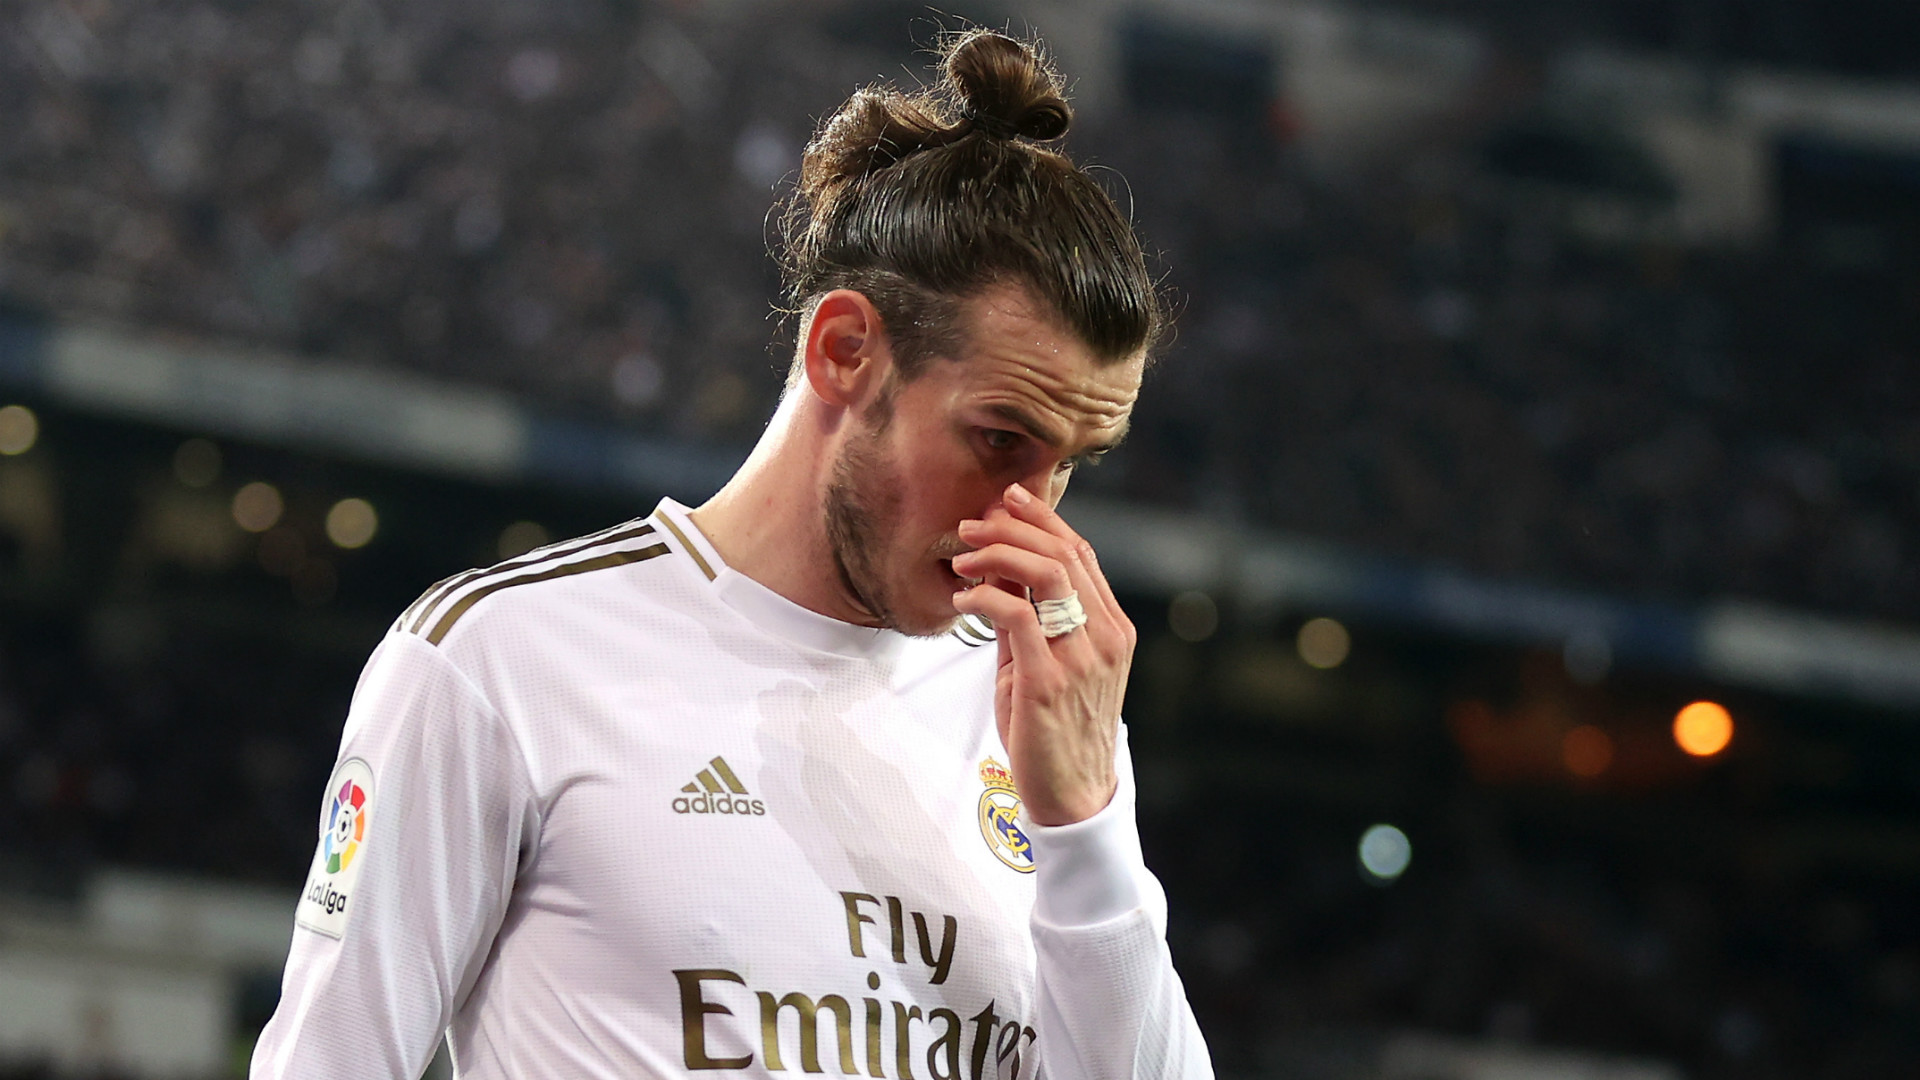 Real Madrid, Gareth Bale ne comprend pas les sifflets